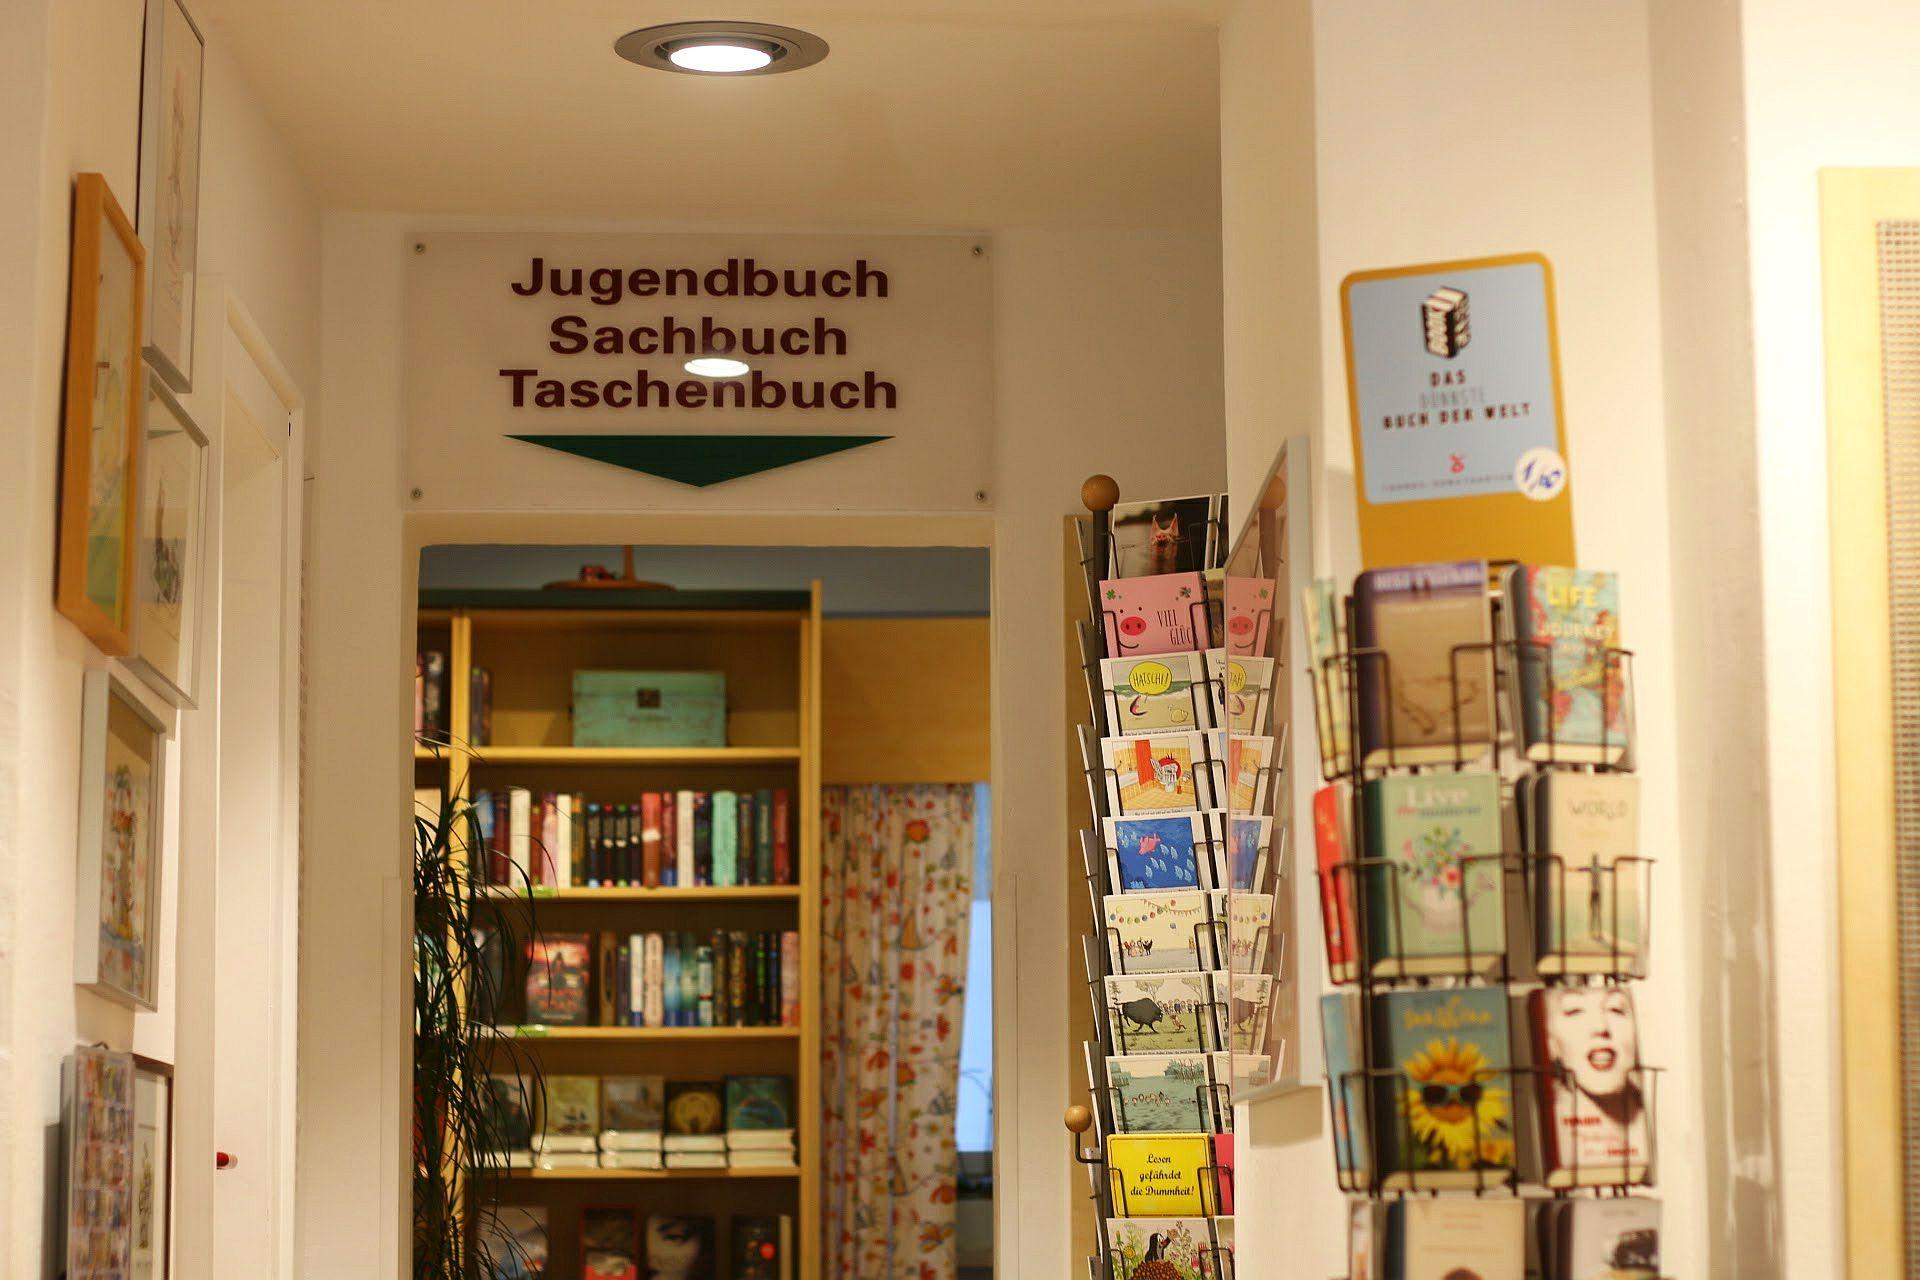 Buchhandlung Schatzinsel Münster Jugendbuch Abteilung Bücher